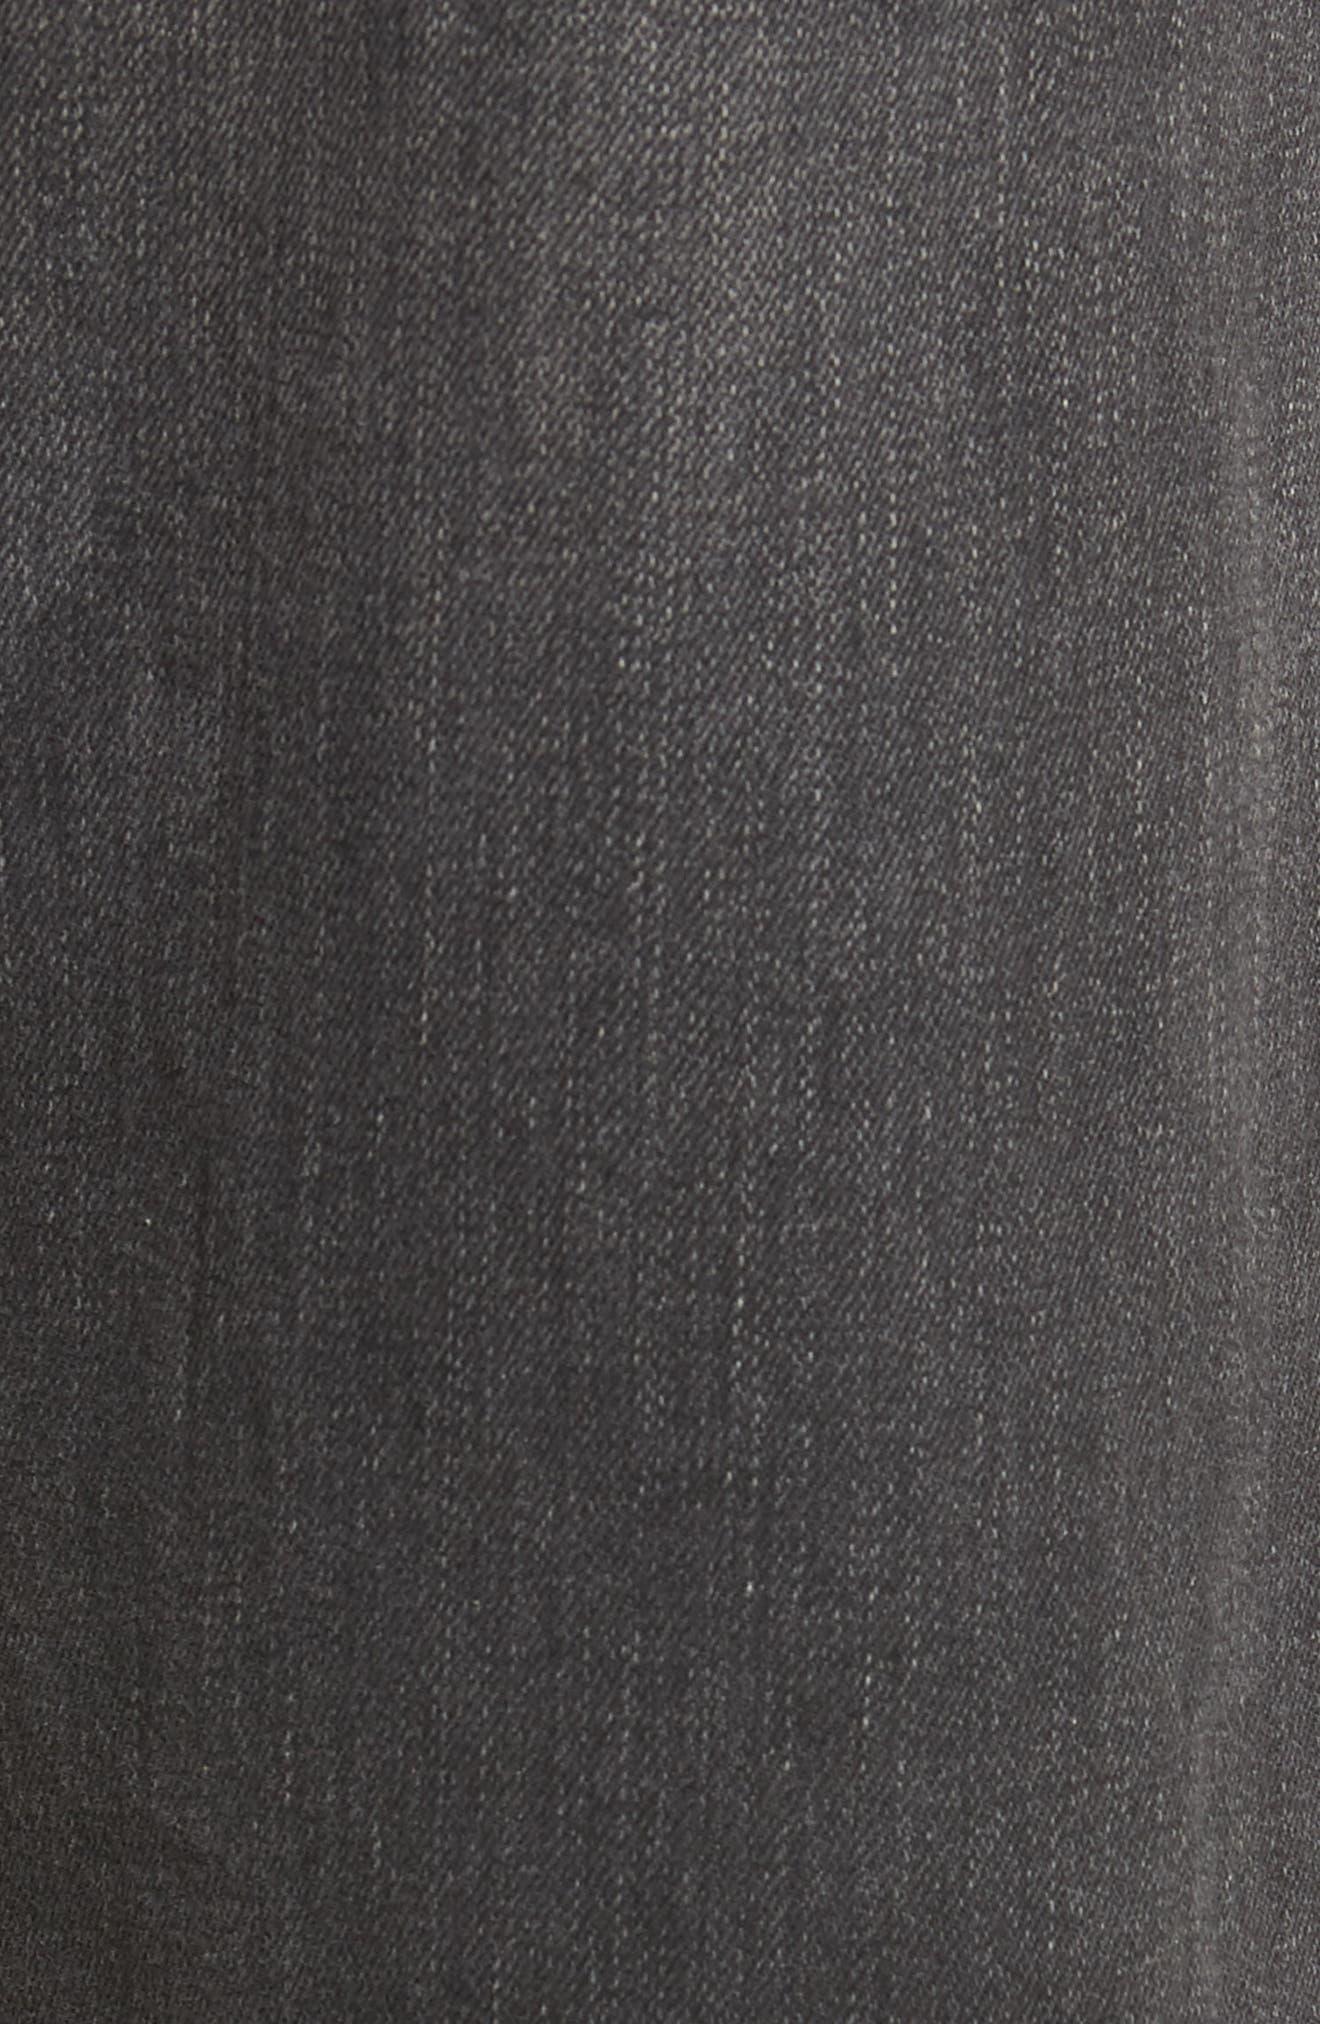 Graduate Slim Straight Leg Jeans,                             Alternate thumbnail 5, color,                             6 YEARS ARCADE